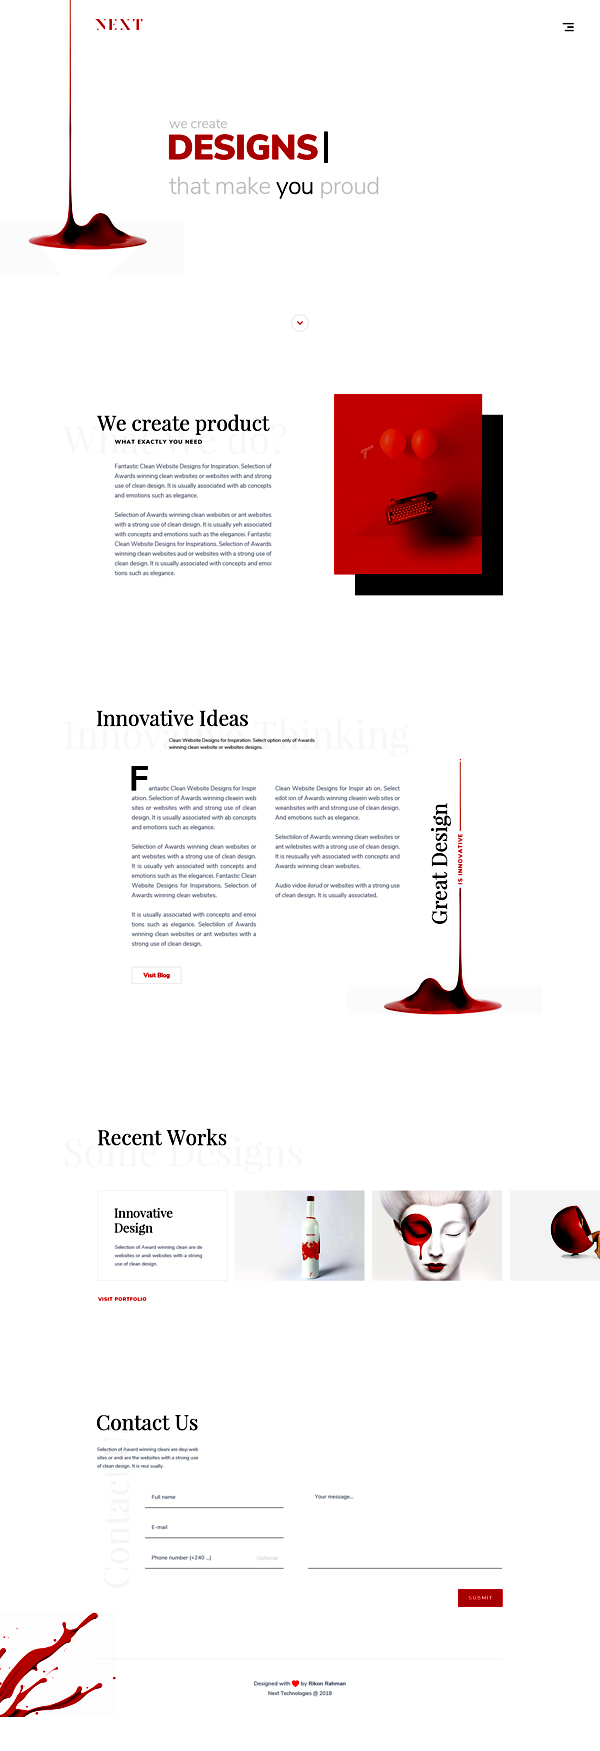 Freebie: Agency Landing Page Design